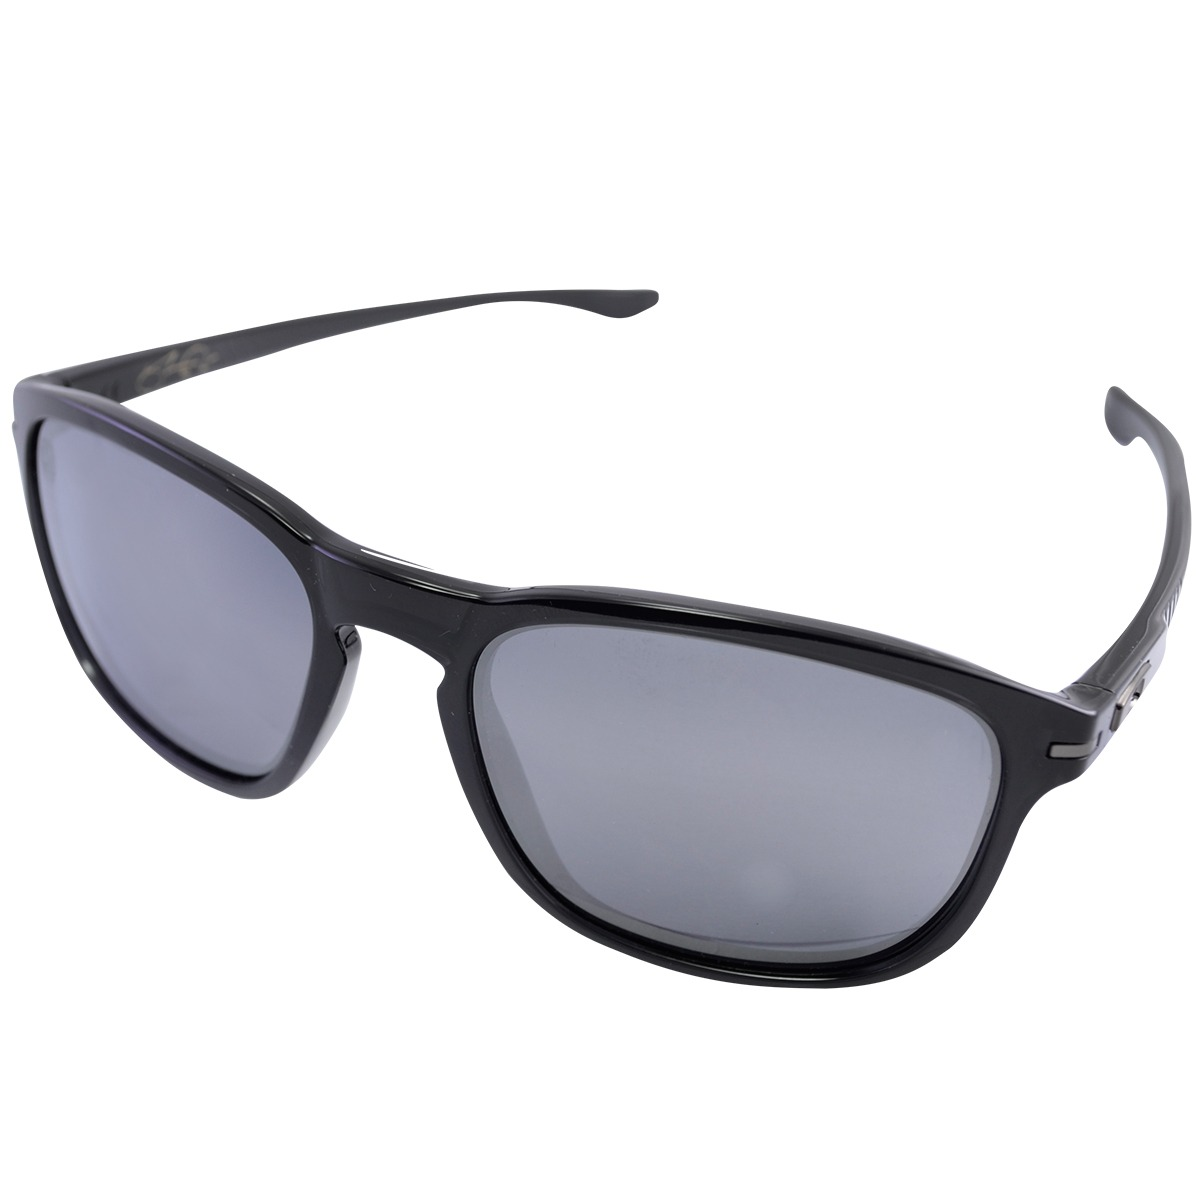 bb3ef69d8ff5d óculos oakley enduro. Carregando zoom.